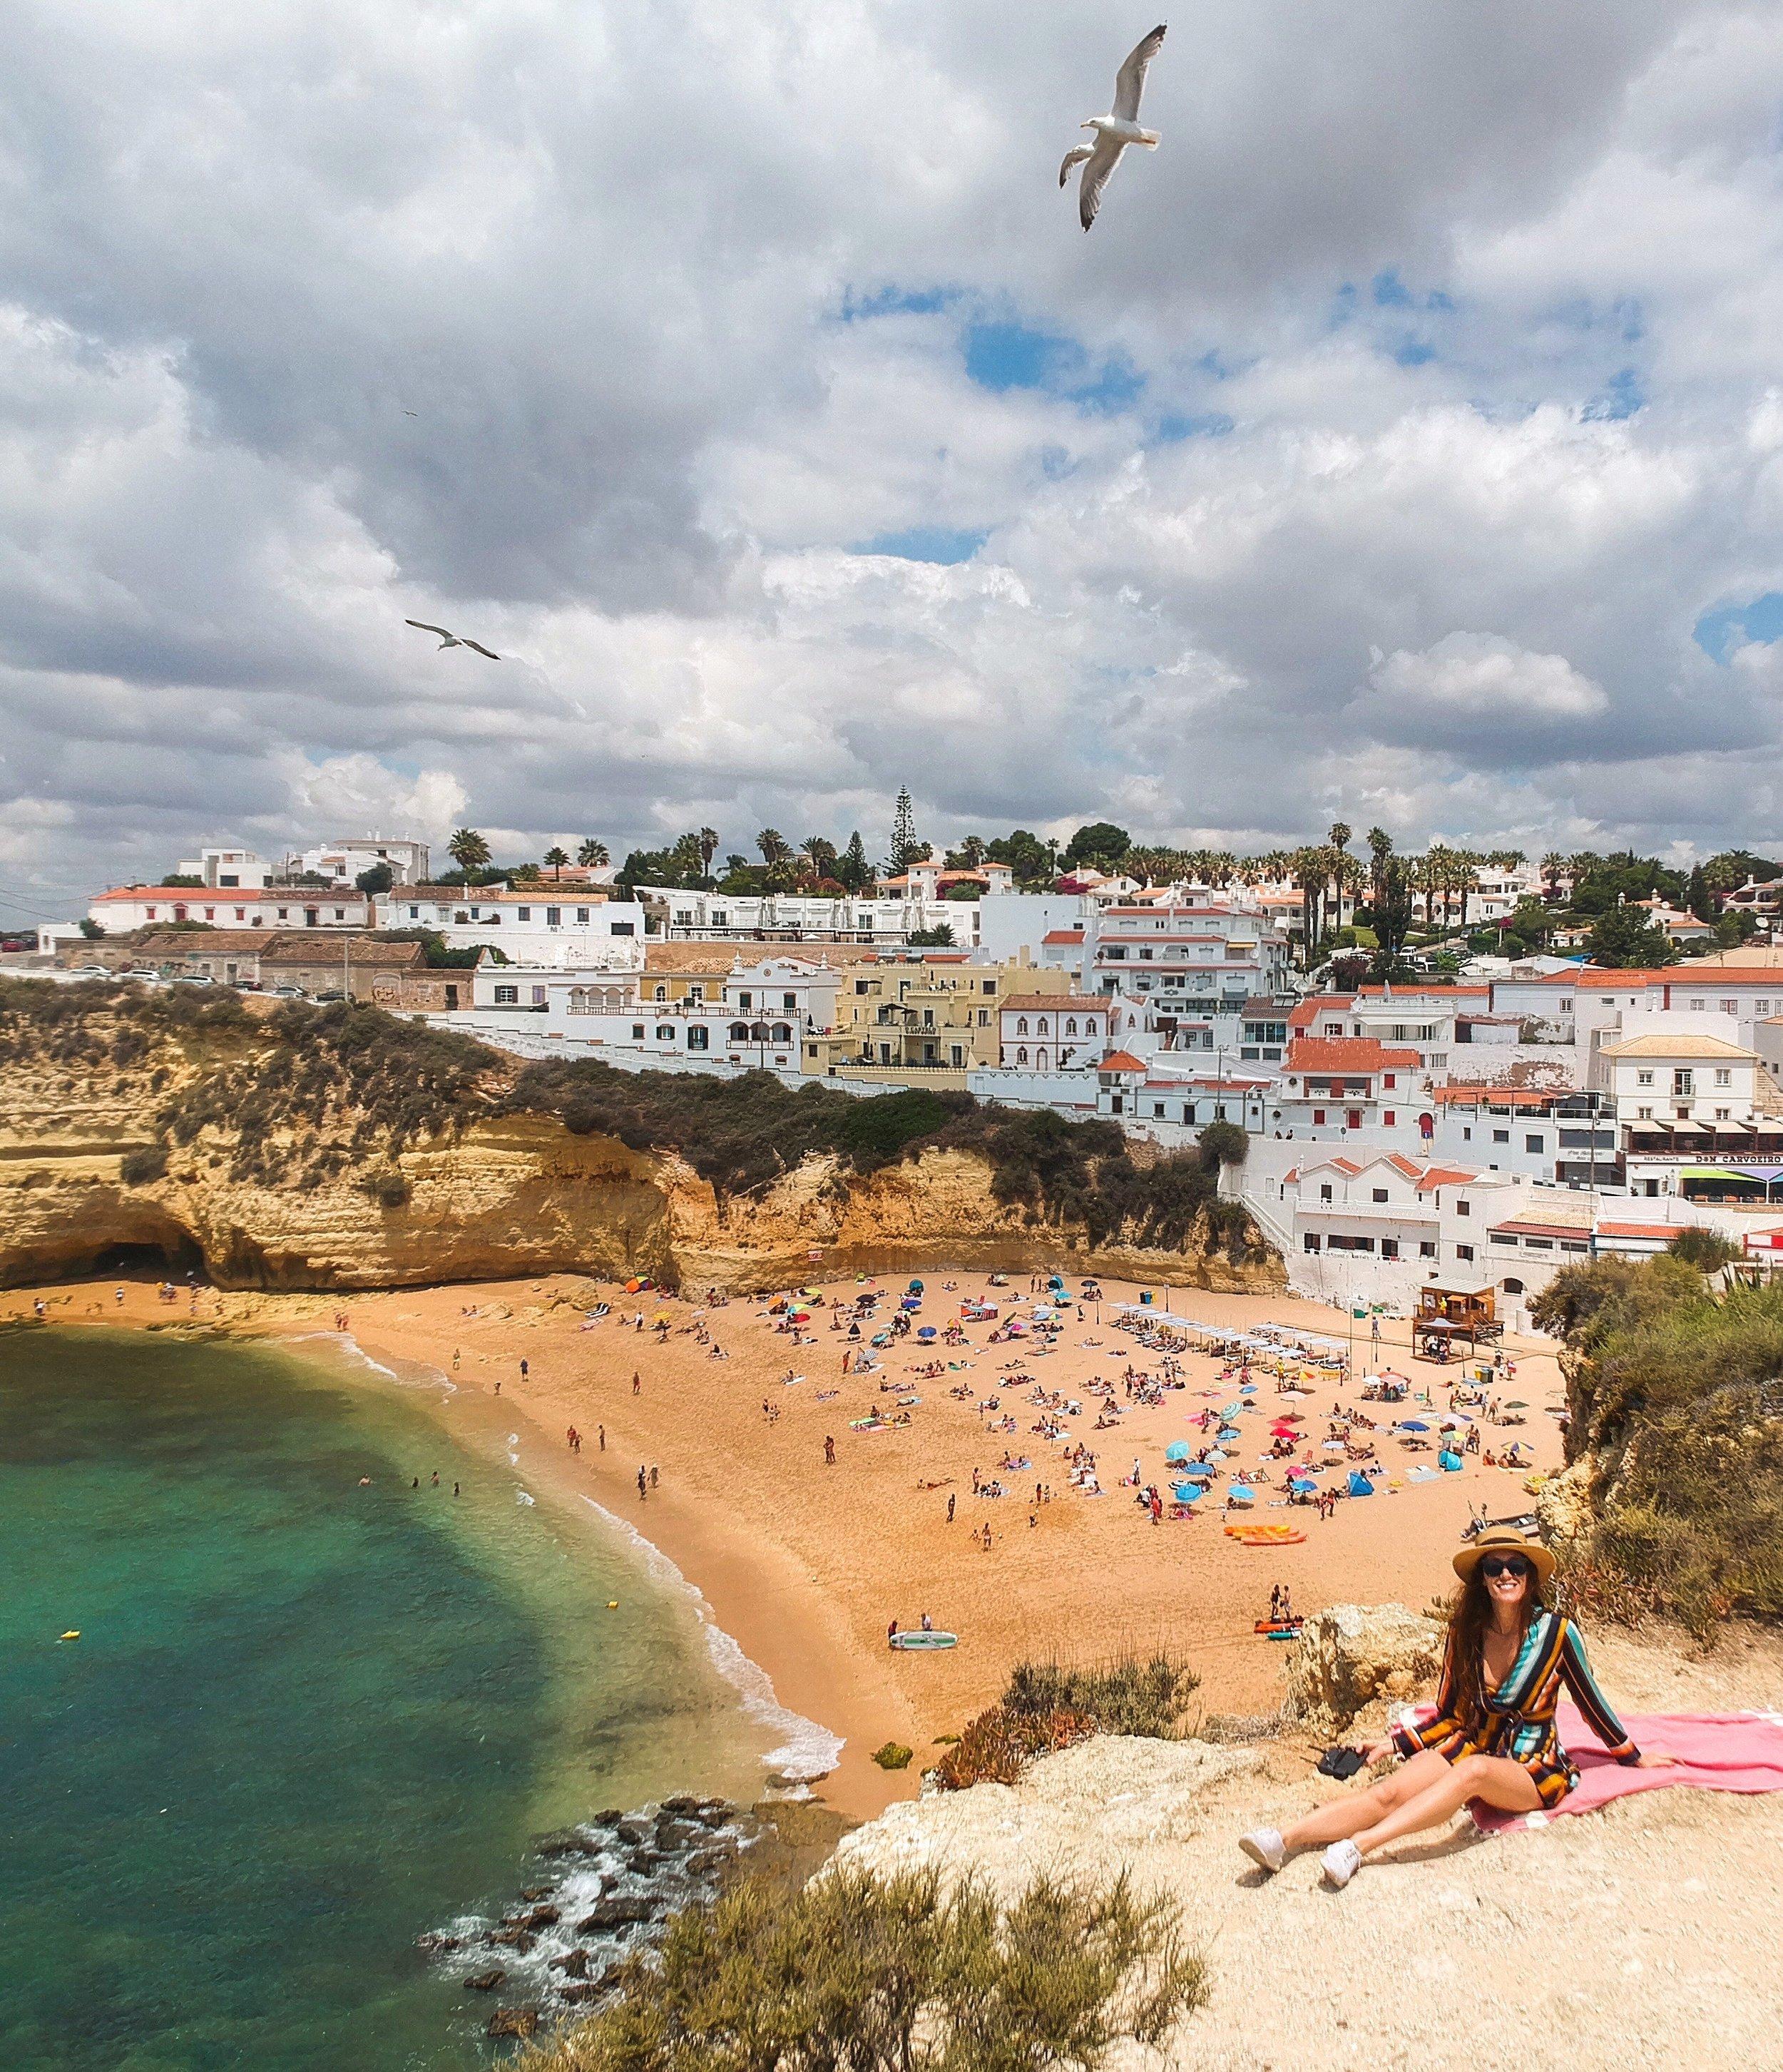 THe view of Praia de Carvoeiro, in Portugal's Algarve